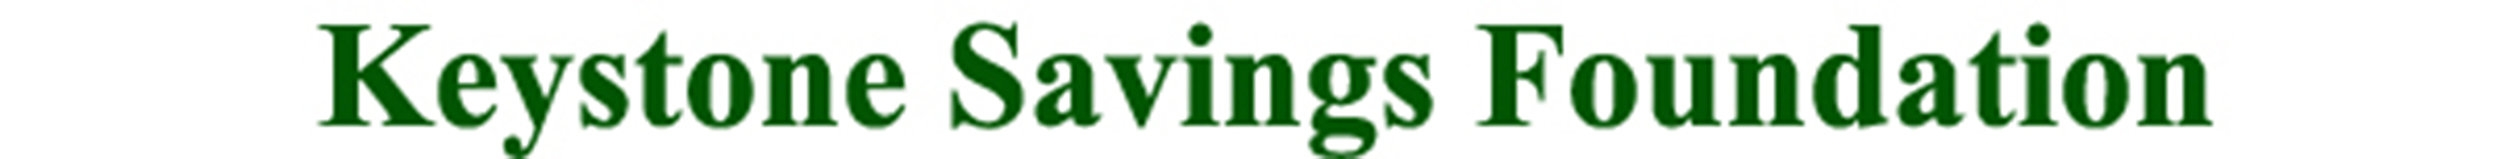 KNCF_Logo copy.jpg